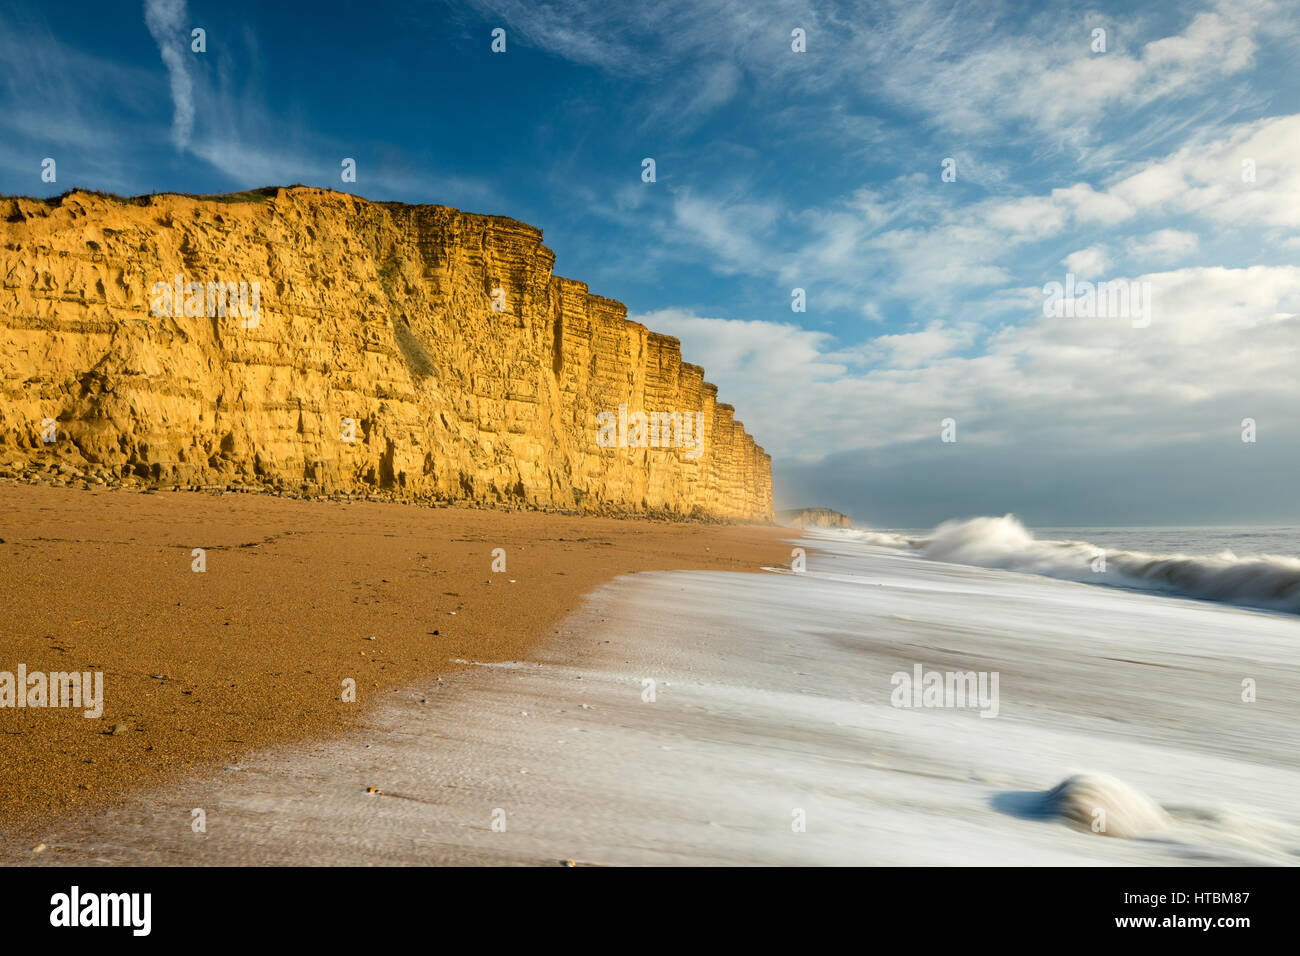 waves breaking on the beach beneath East Cliff, West Bay, Jurassic Coast, Dorset, England, UK Stock Photo